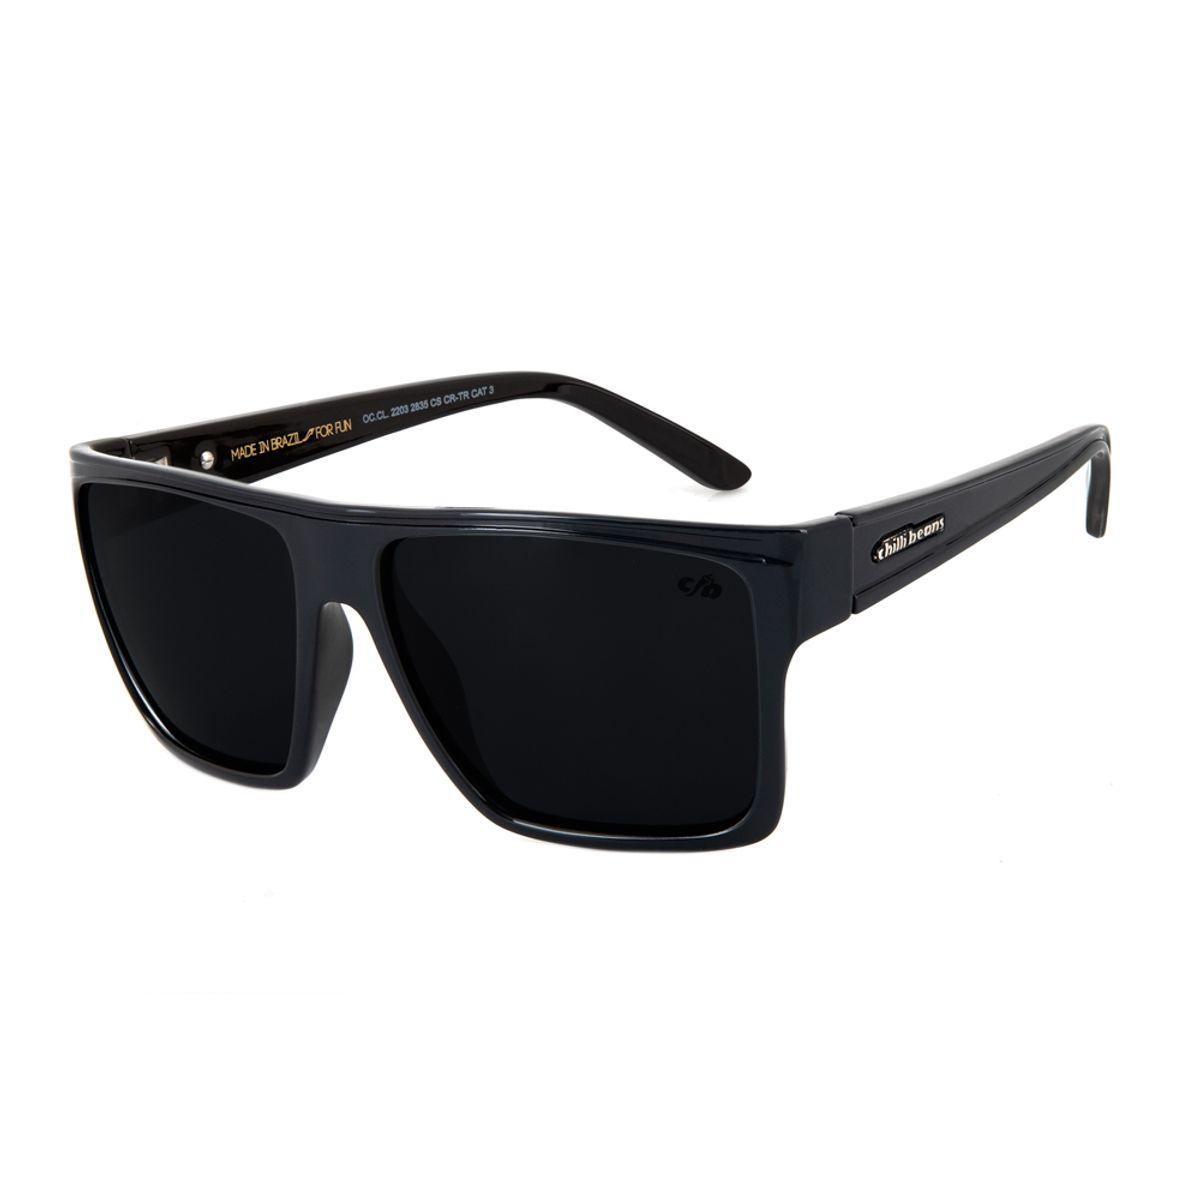 23dd1af792f3c Óculos De Sol Chilli Beans Unissex Quadrado Preto Polarizado 2203 ...